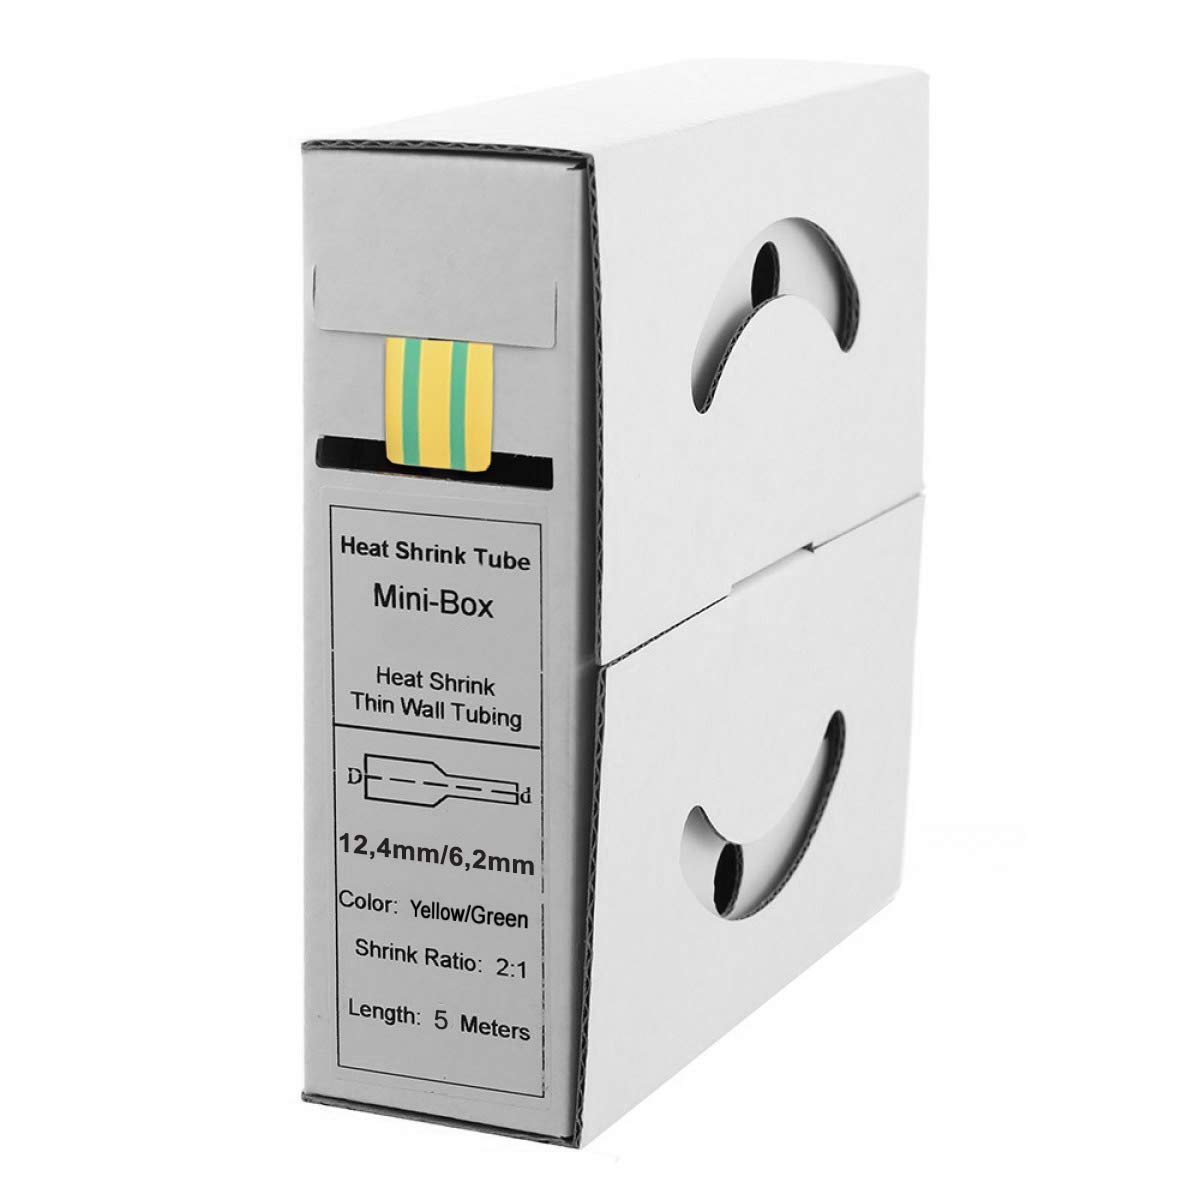 Offgridtec Heat Shrink Tubing 5 m and 10 m 2:1 Yellow//Green Dispenser Box Workshop Car 1,2mm0,6mm 1